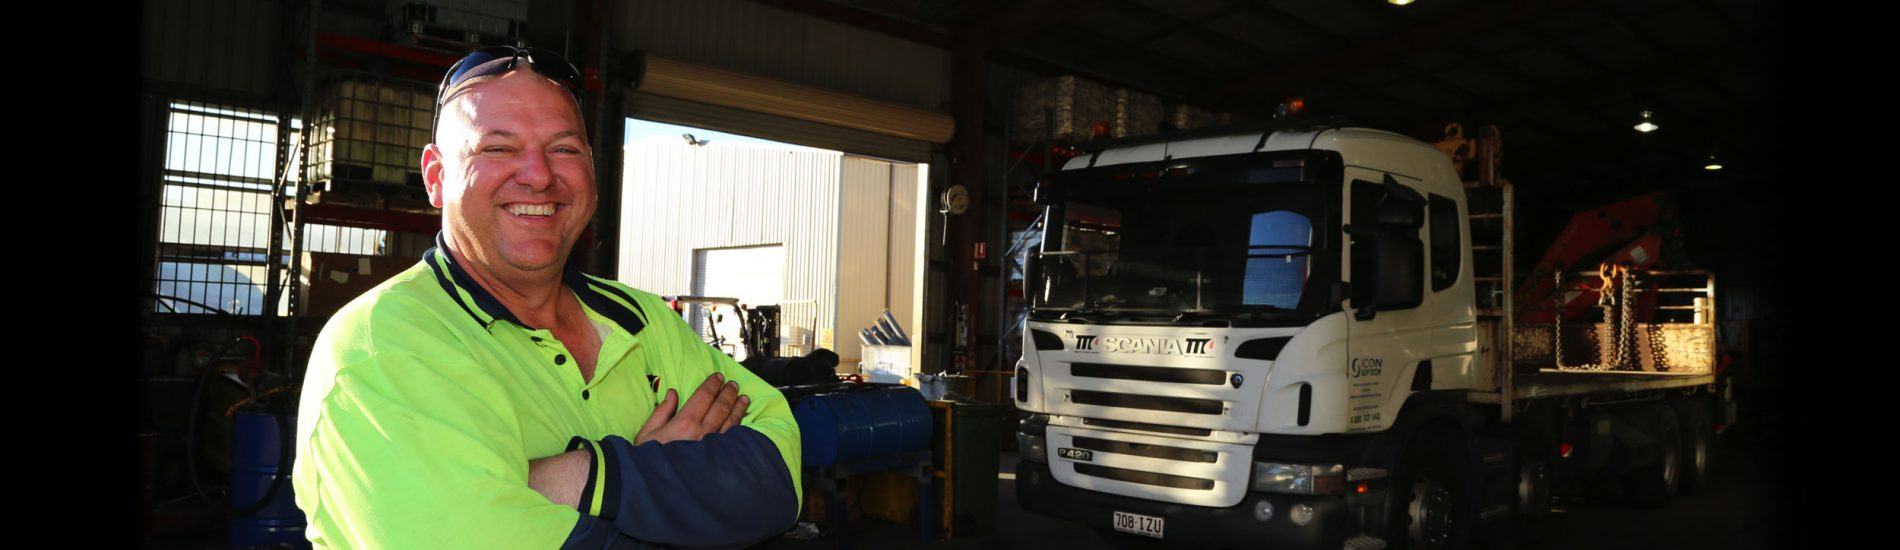 Brisbane Heavy Haulage - Team Transport & Logistics - Our Team